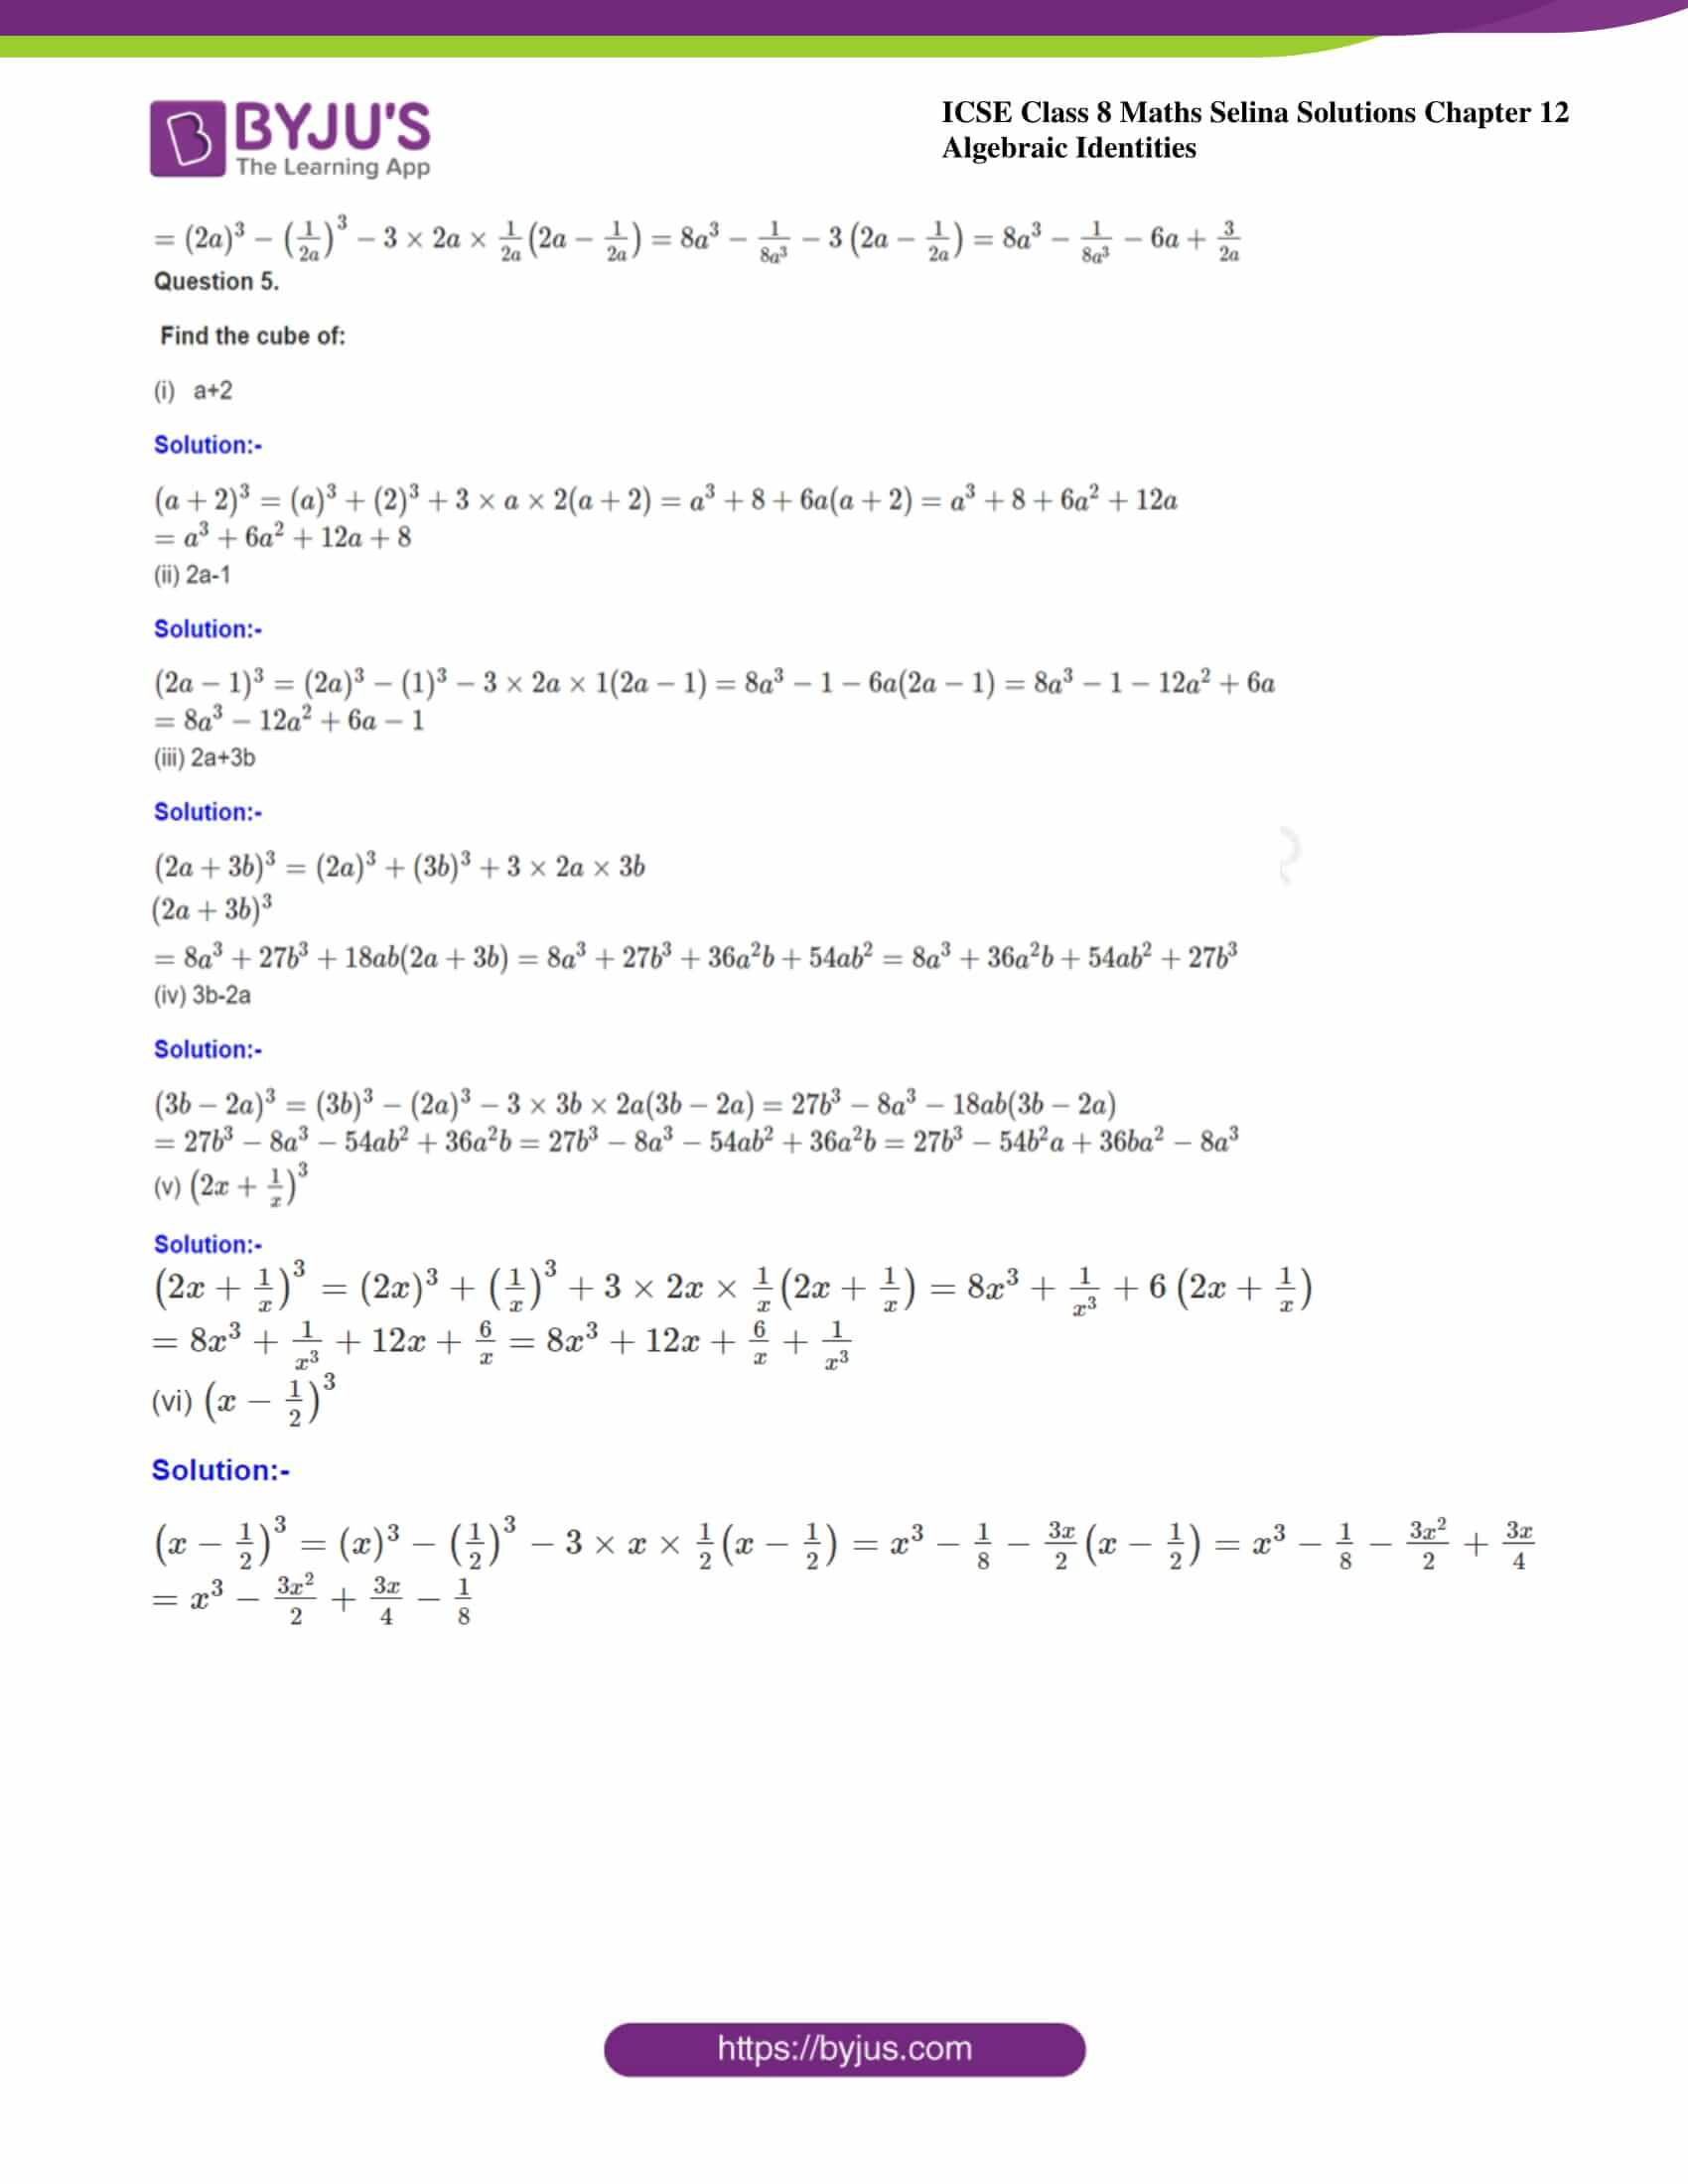 icse class 8 maths may3 selina solutions chapter 12 algebraic identities 10